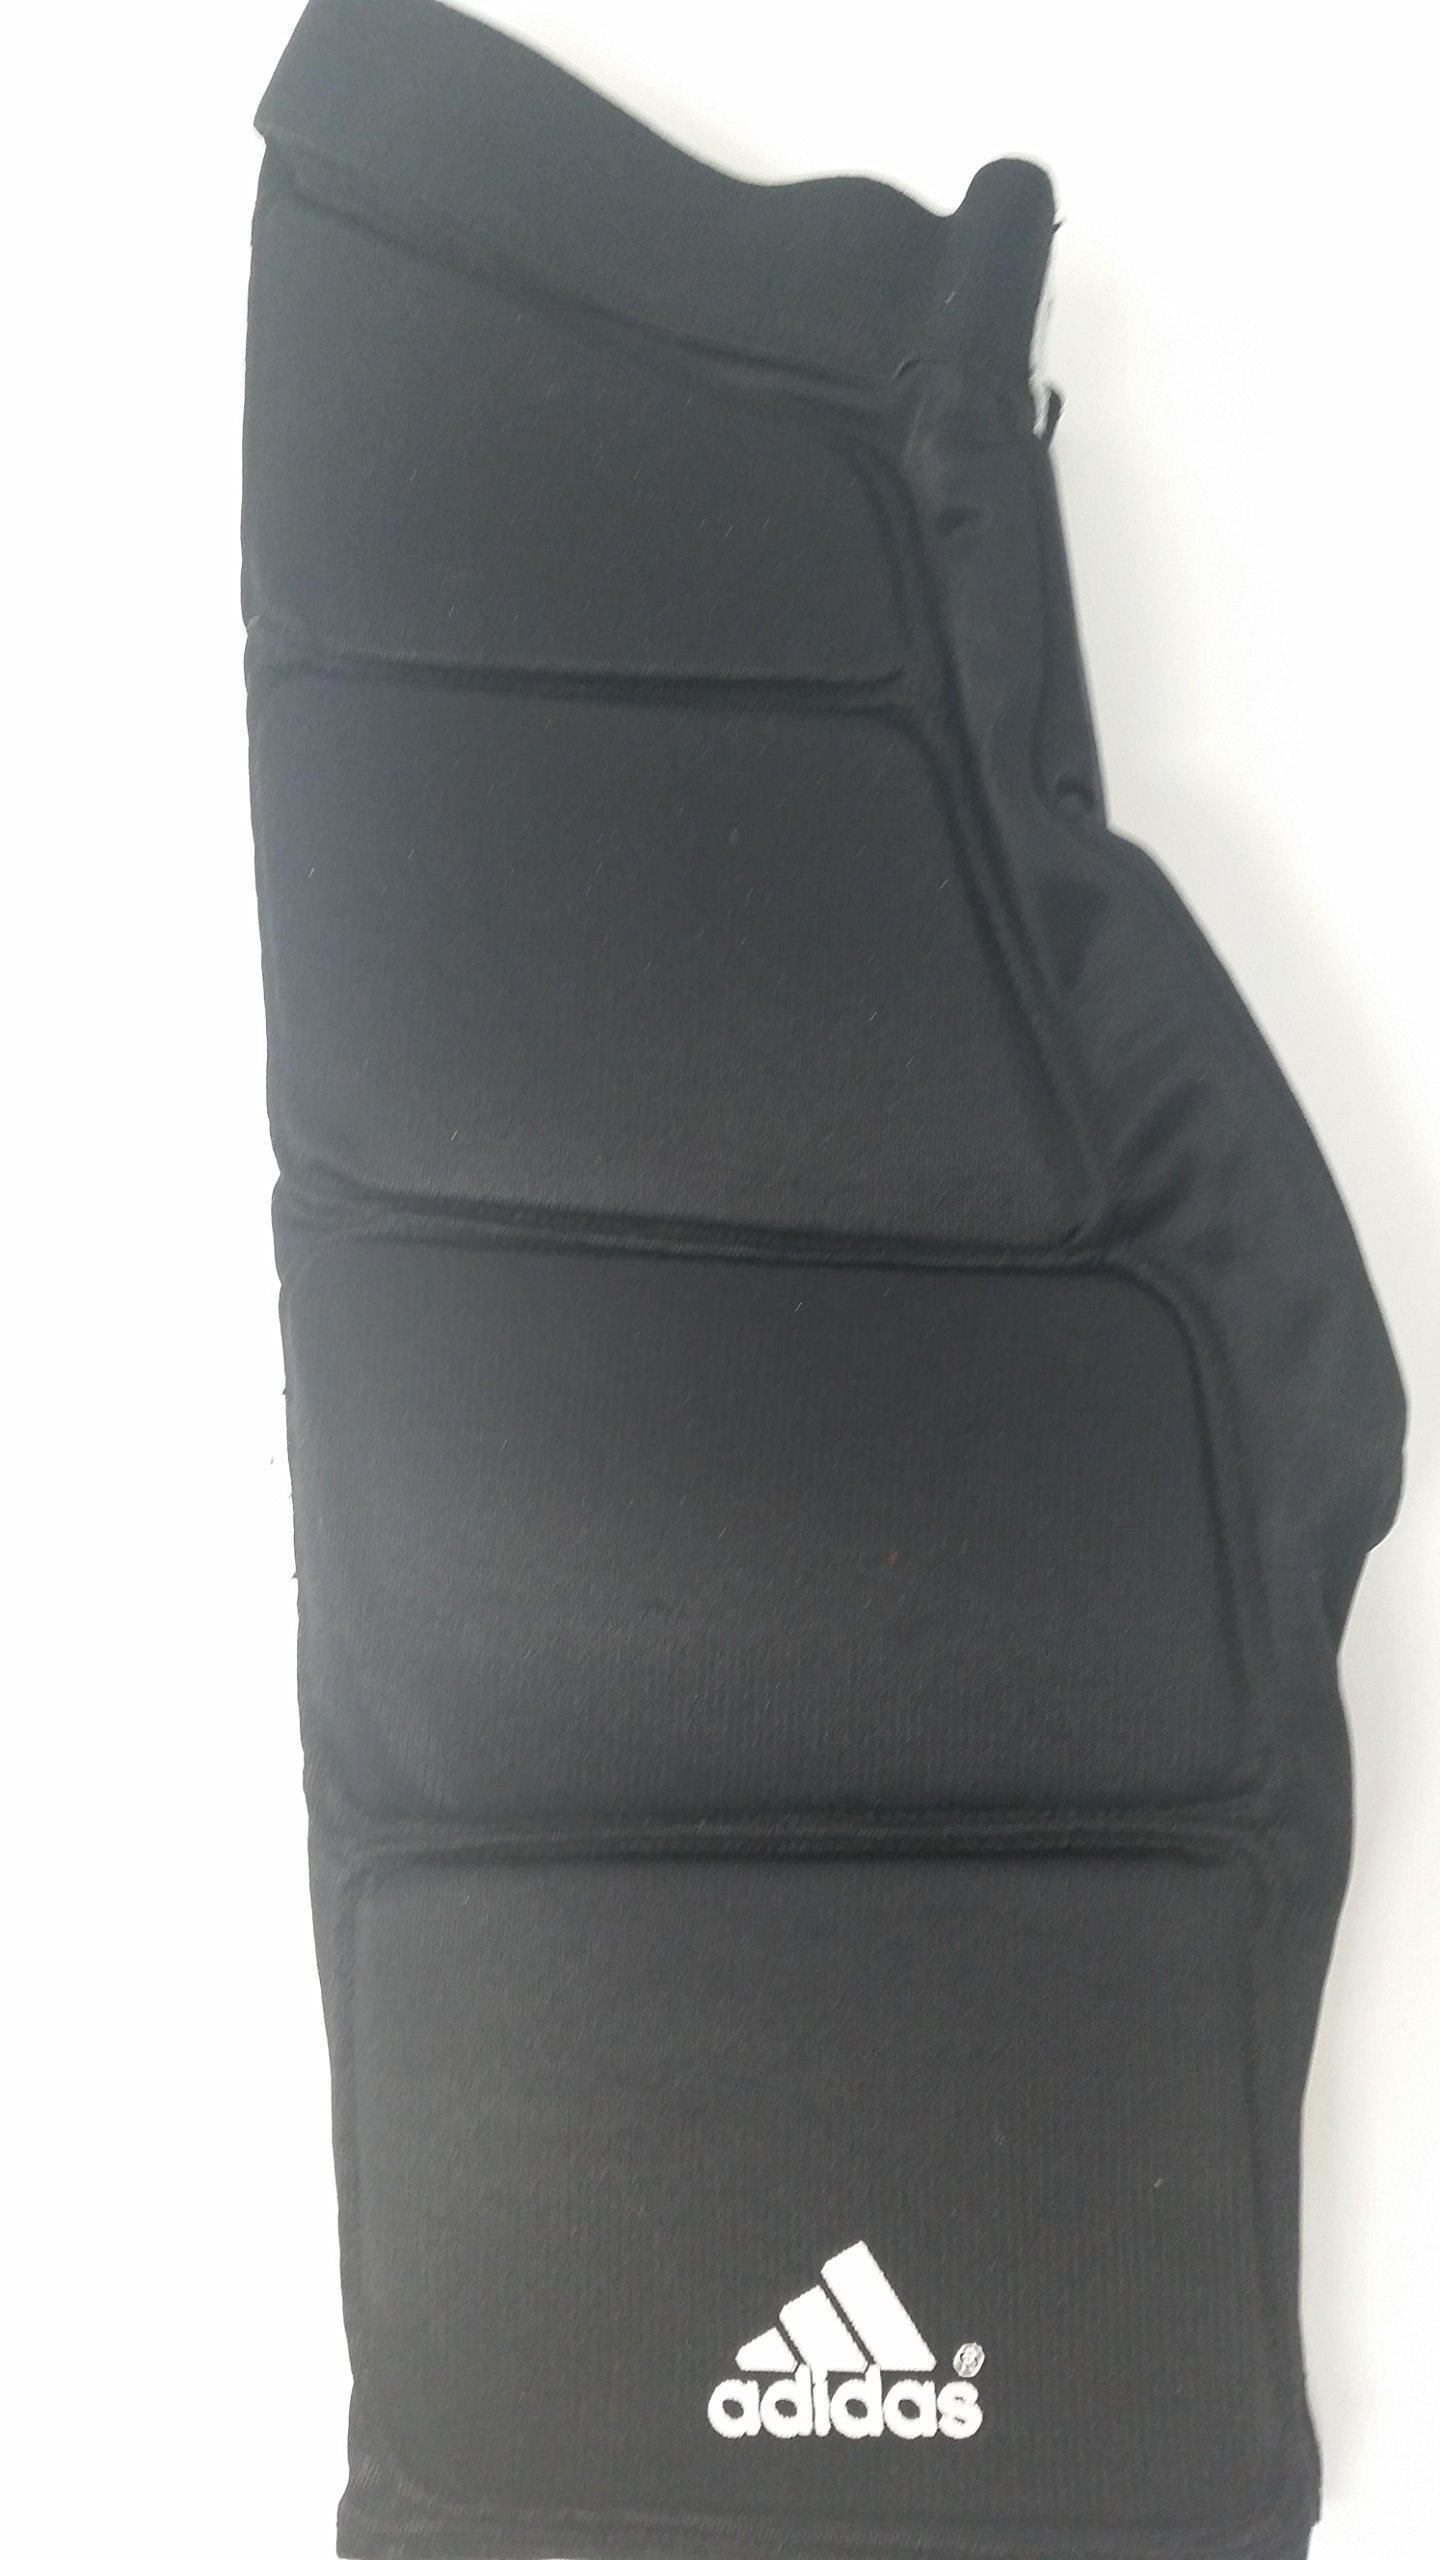 adidas New 7390107 Adult X-Large Black Goalie Protective Pants GP.209 Lacrosse by adidas (Image #2)